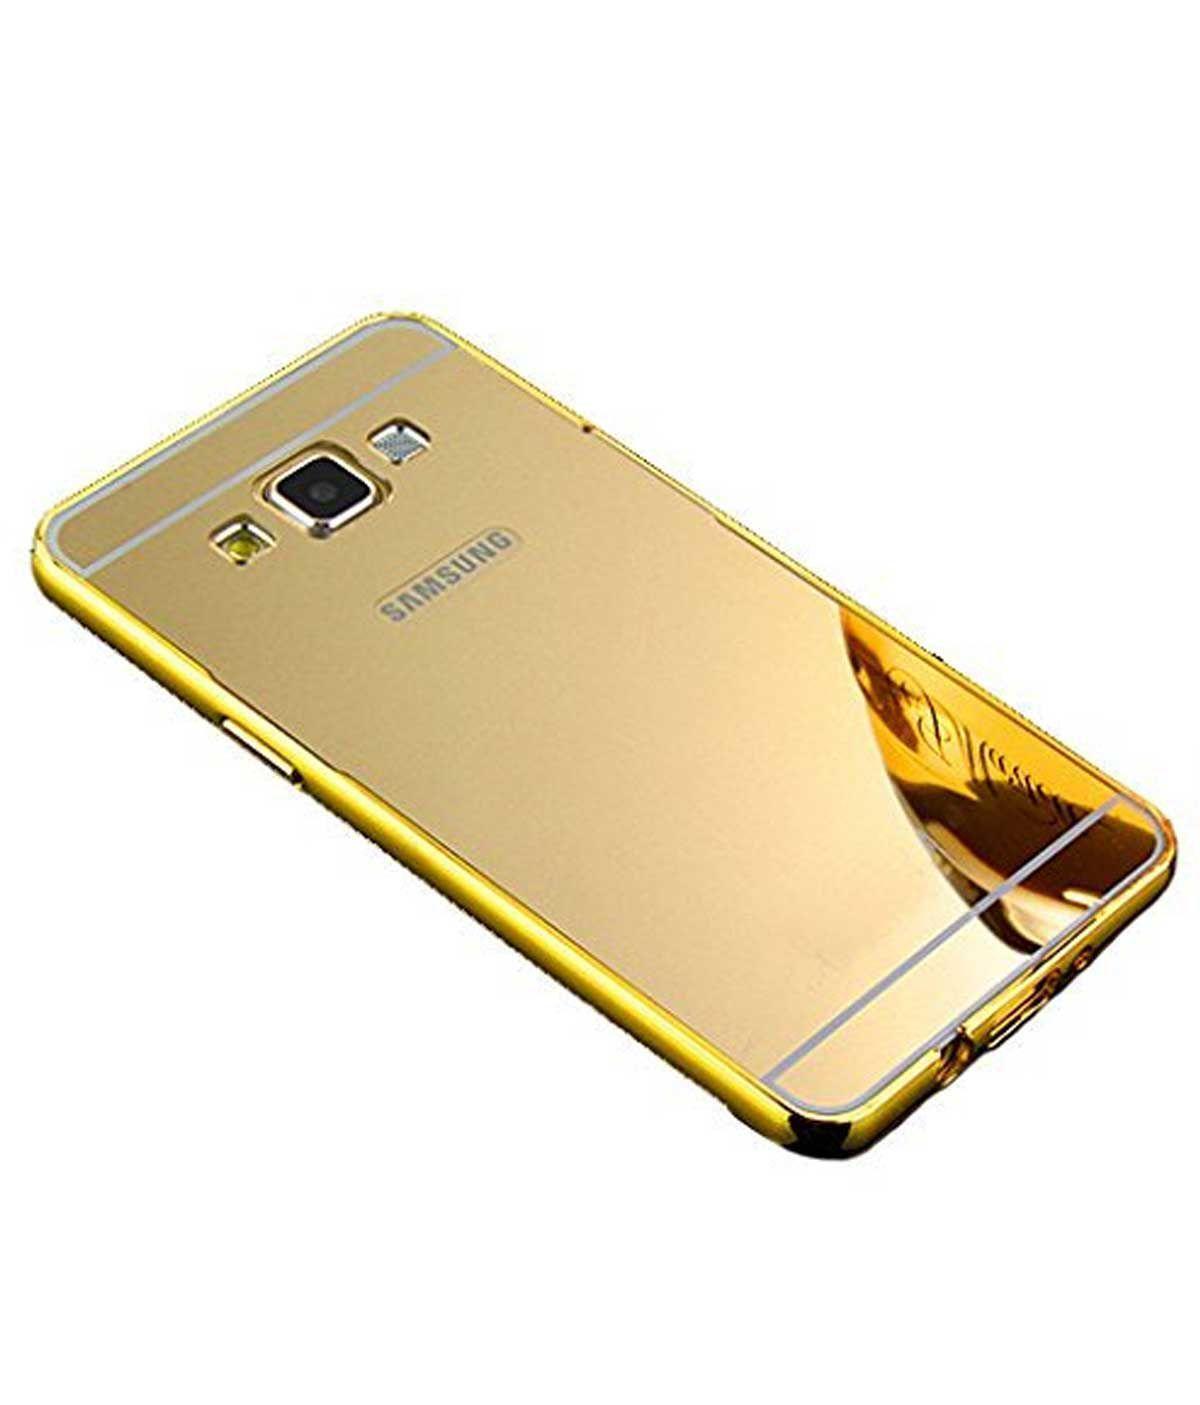 newest 65123 c5bd6 TBZ Metal Bumper Acrylic Mirror Back Cover Case for Samsung Galaxy J7 2016  -Golden